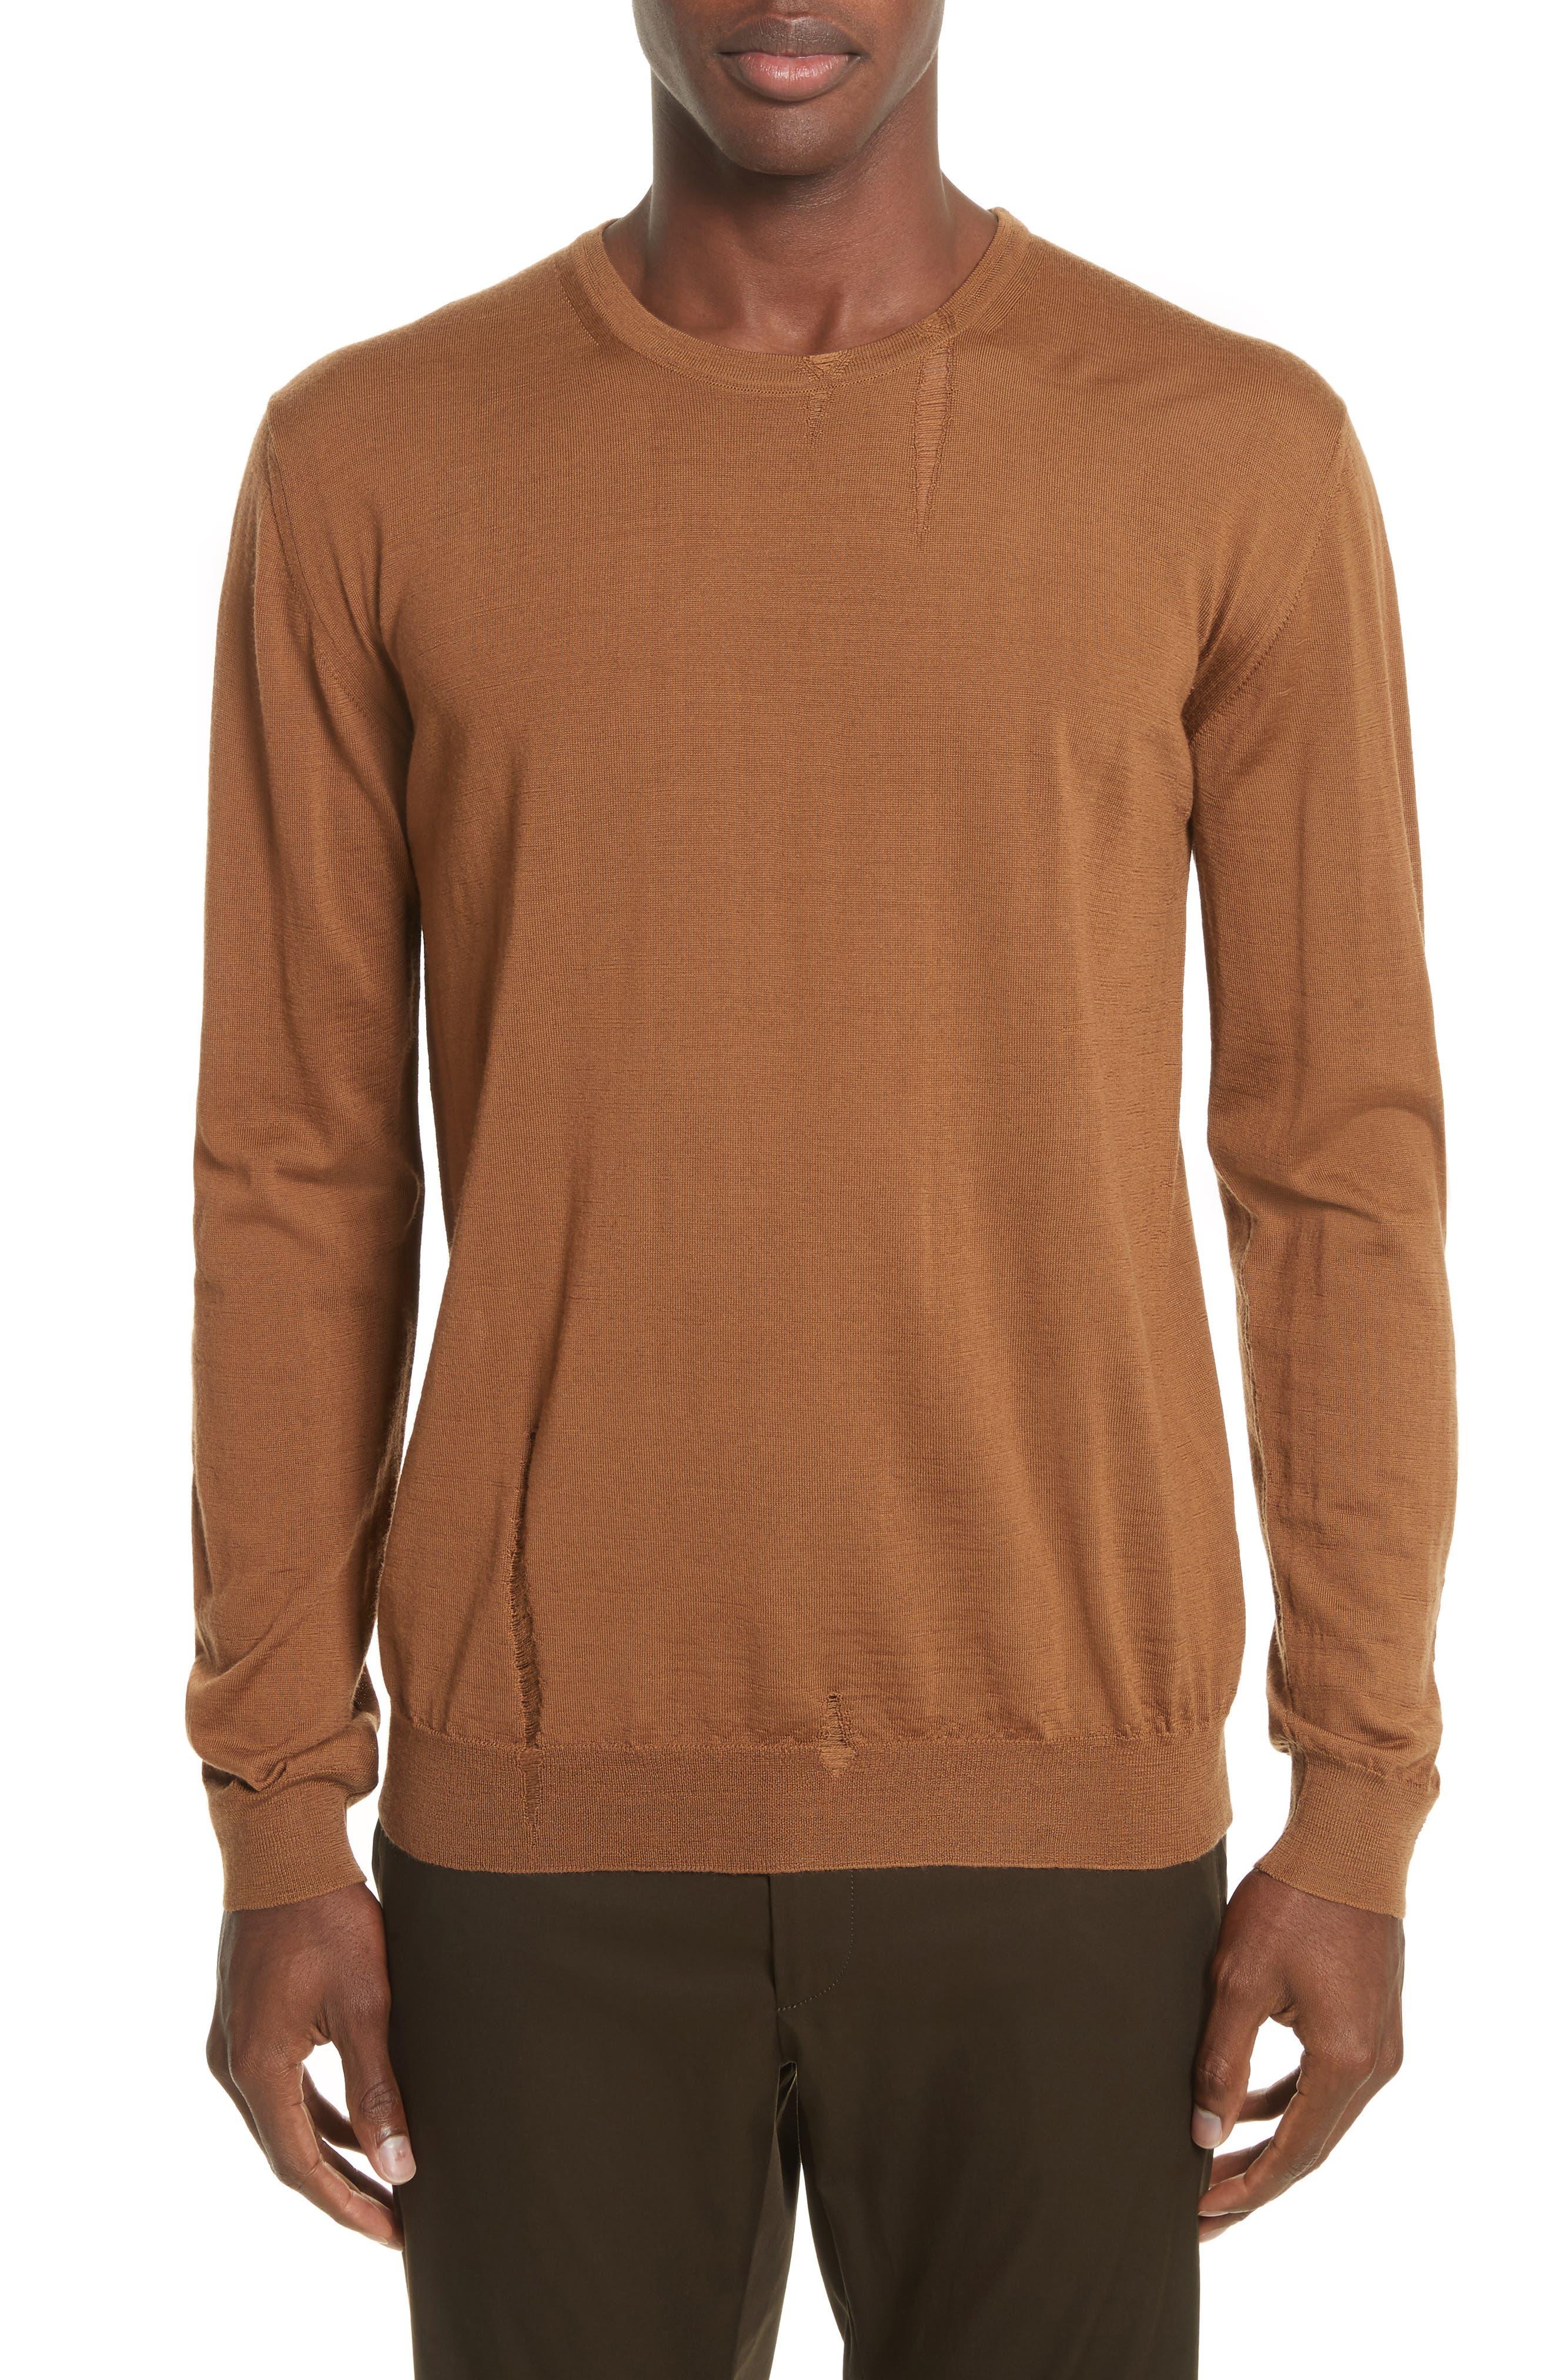 Lanvin Open Stitch Wool Sweater